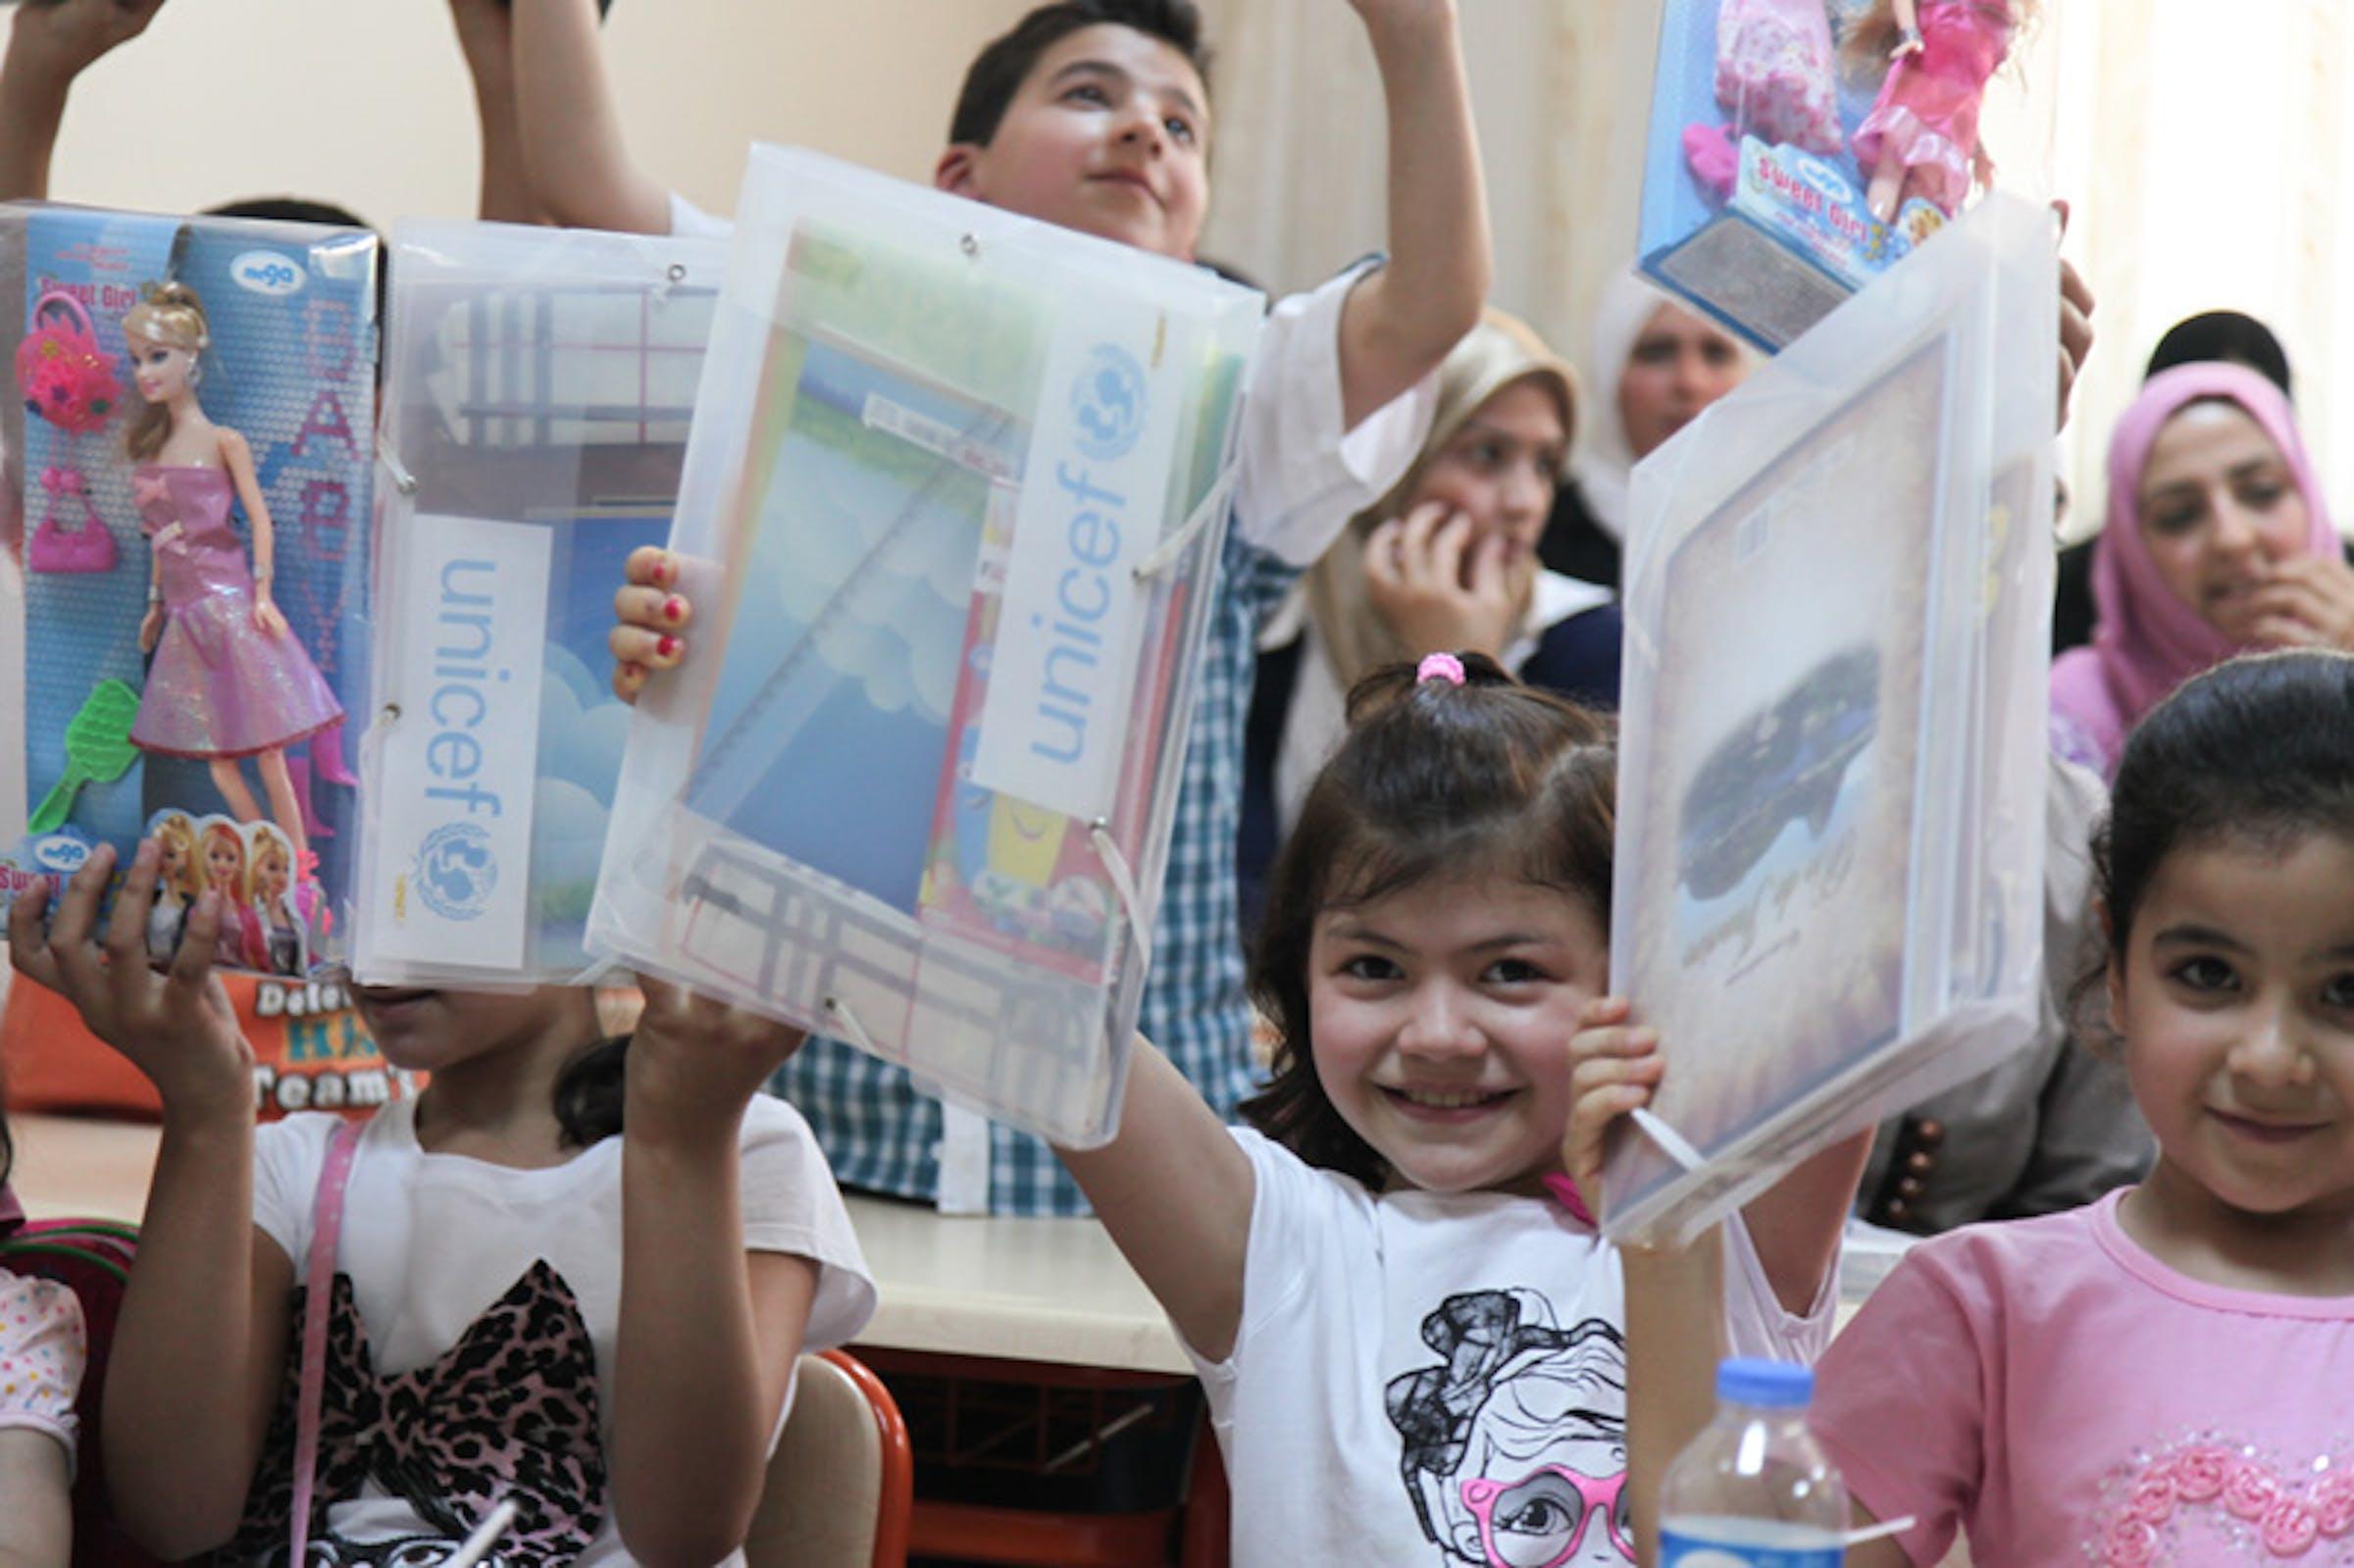 Alunni siriani rifugiati a Urfa (Turchia) mostrano i materiali didattici ricevuti dall'UNICEF - ©UNICEF Turchia/2013/K.Feyizoglu